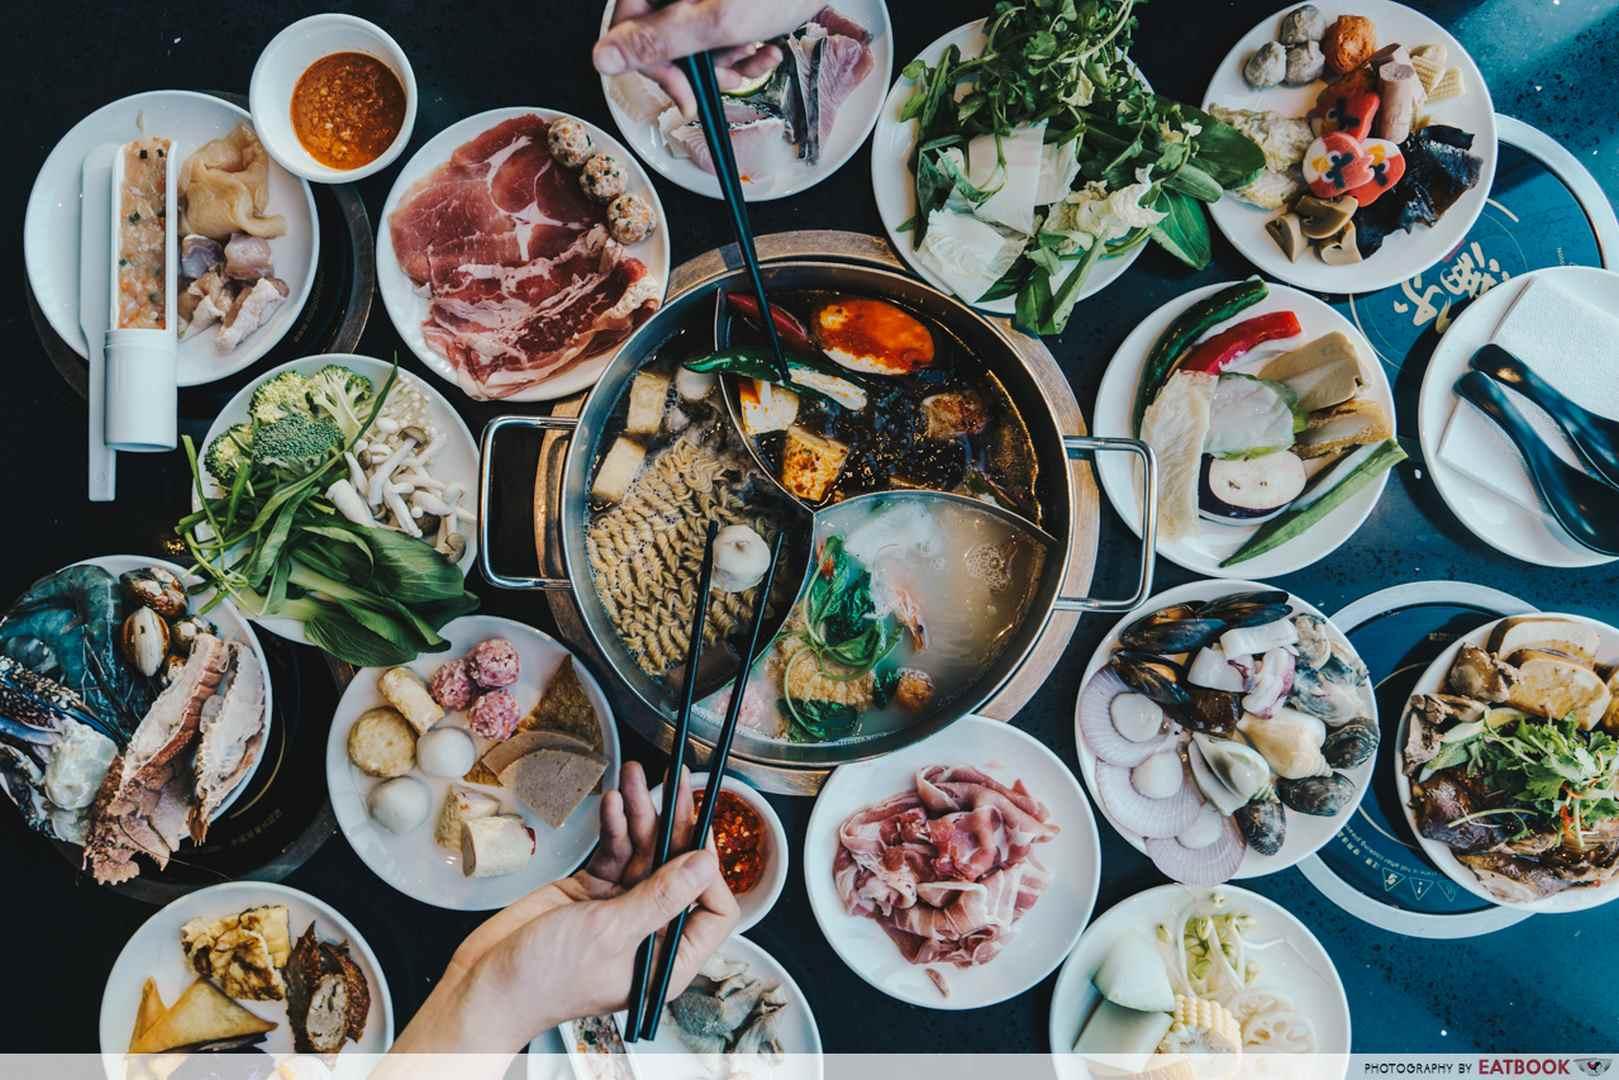 Downtown East Family Restaurants Manle Spread